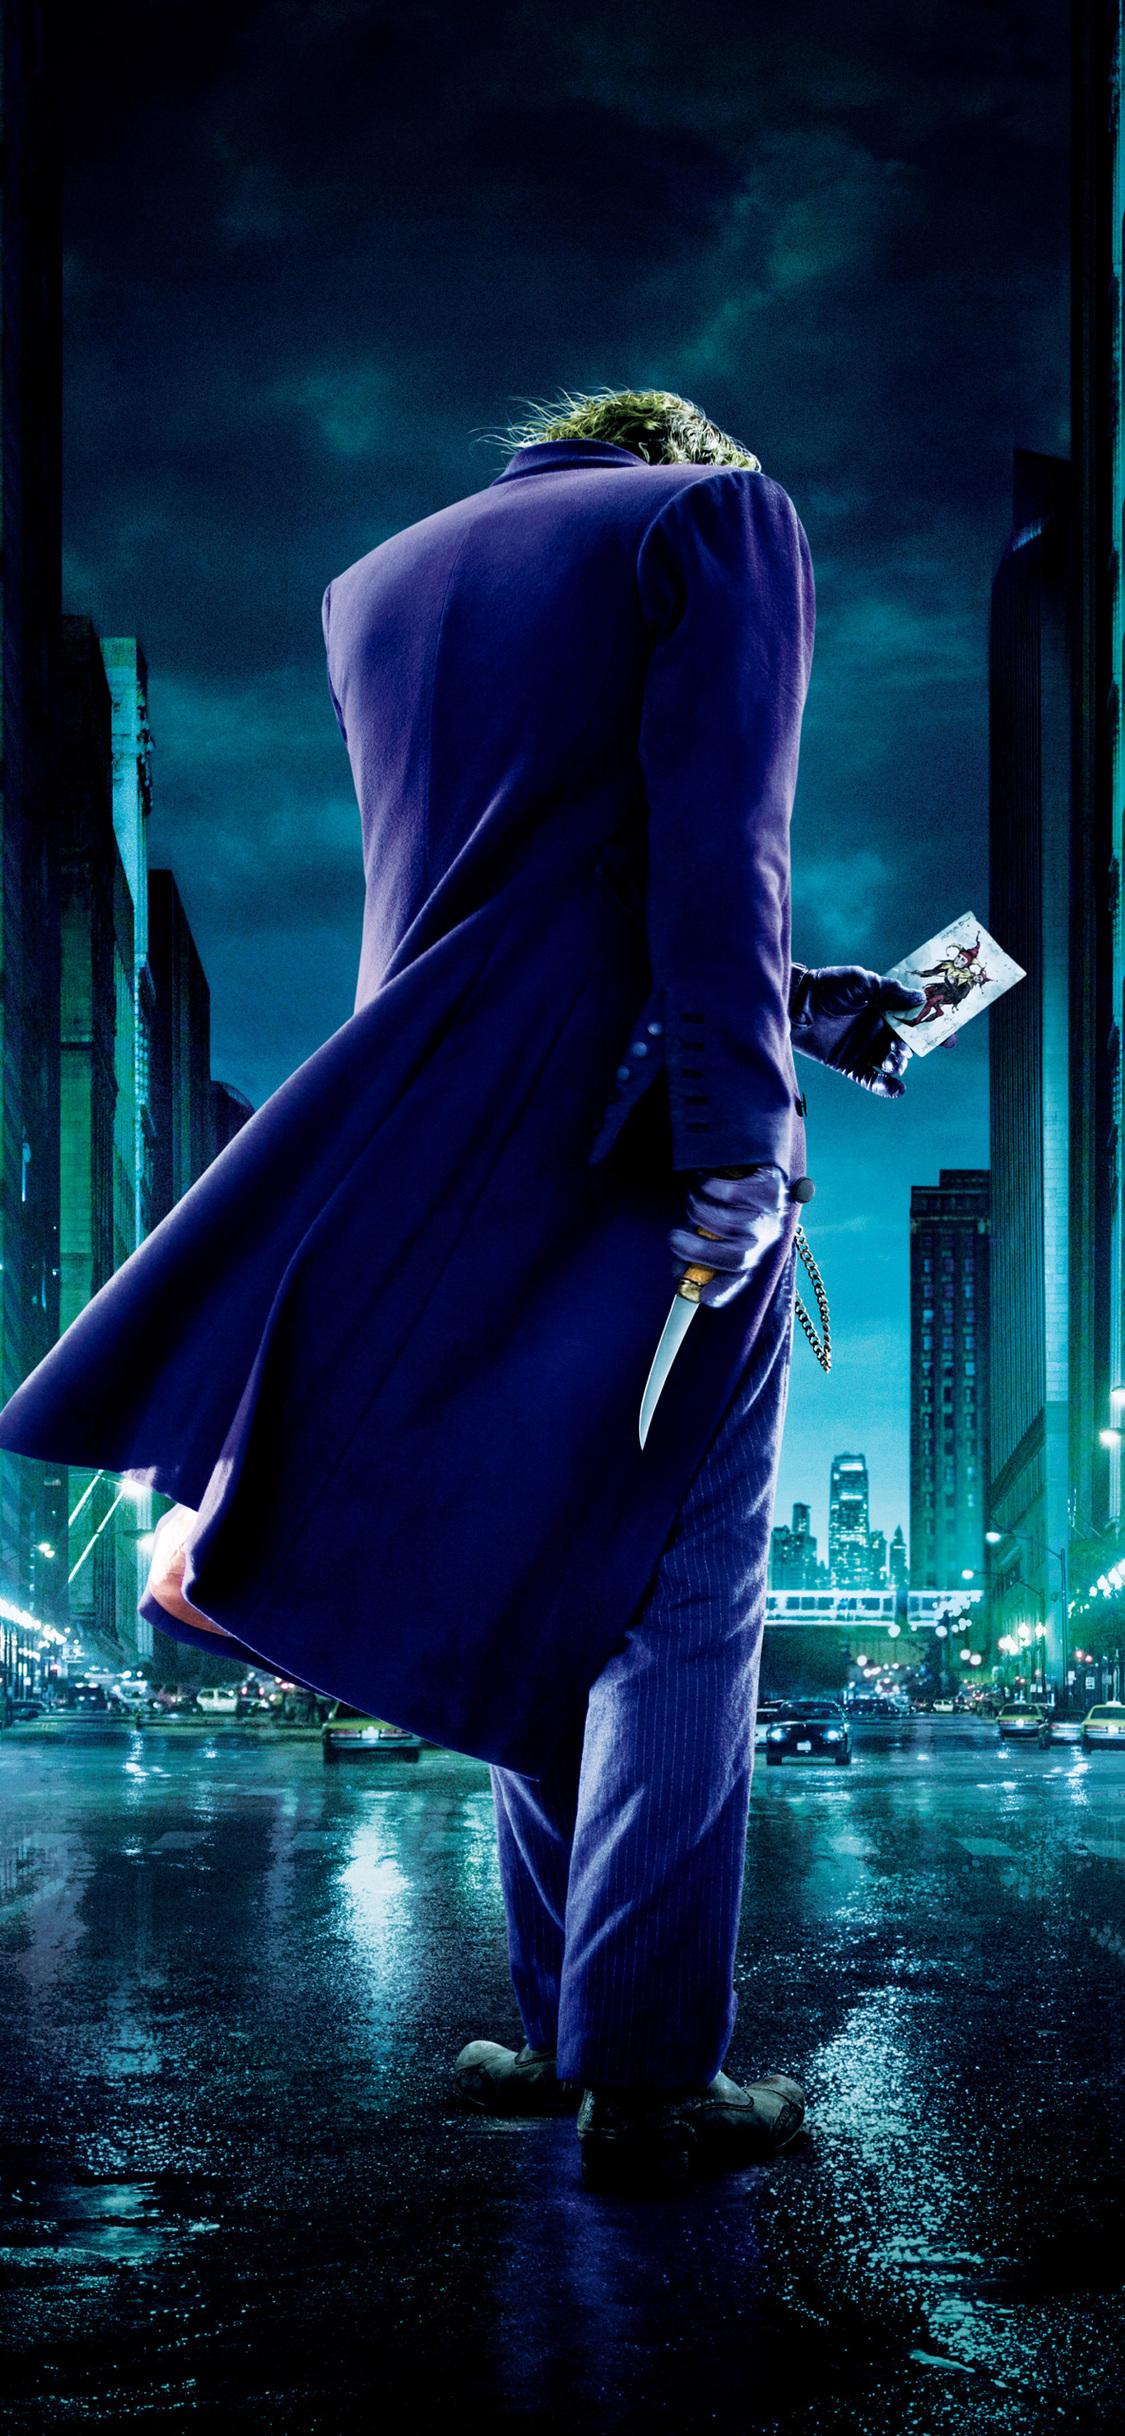 1125x2436 Joker The Dark Knight 4k Iphone XS,Iphone 10 ...